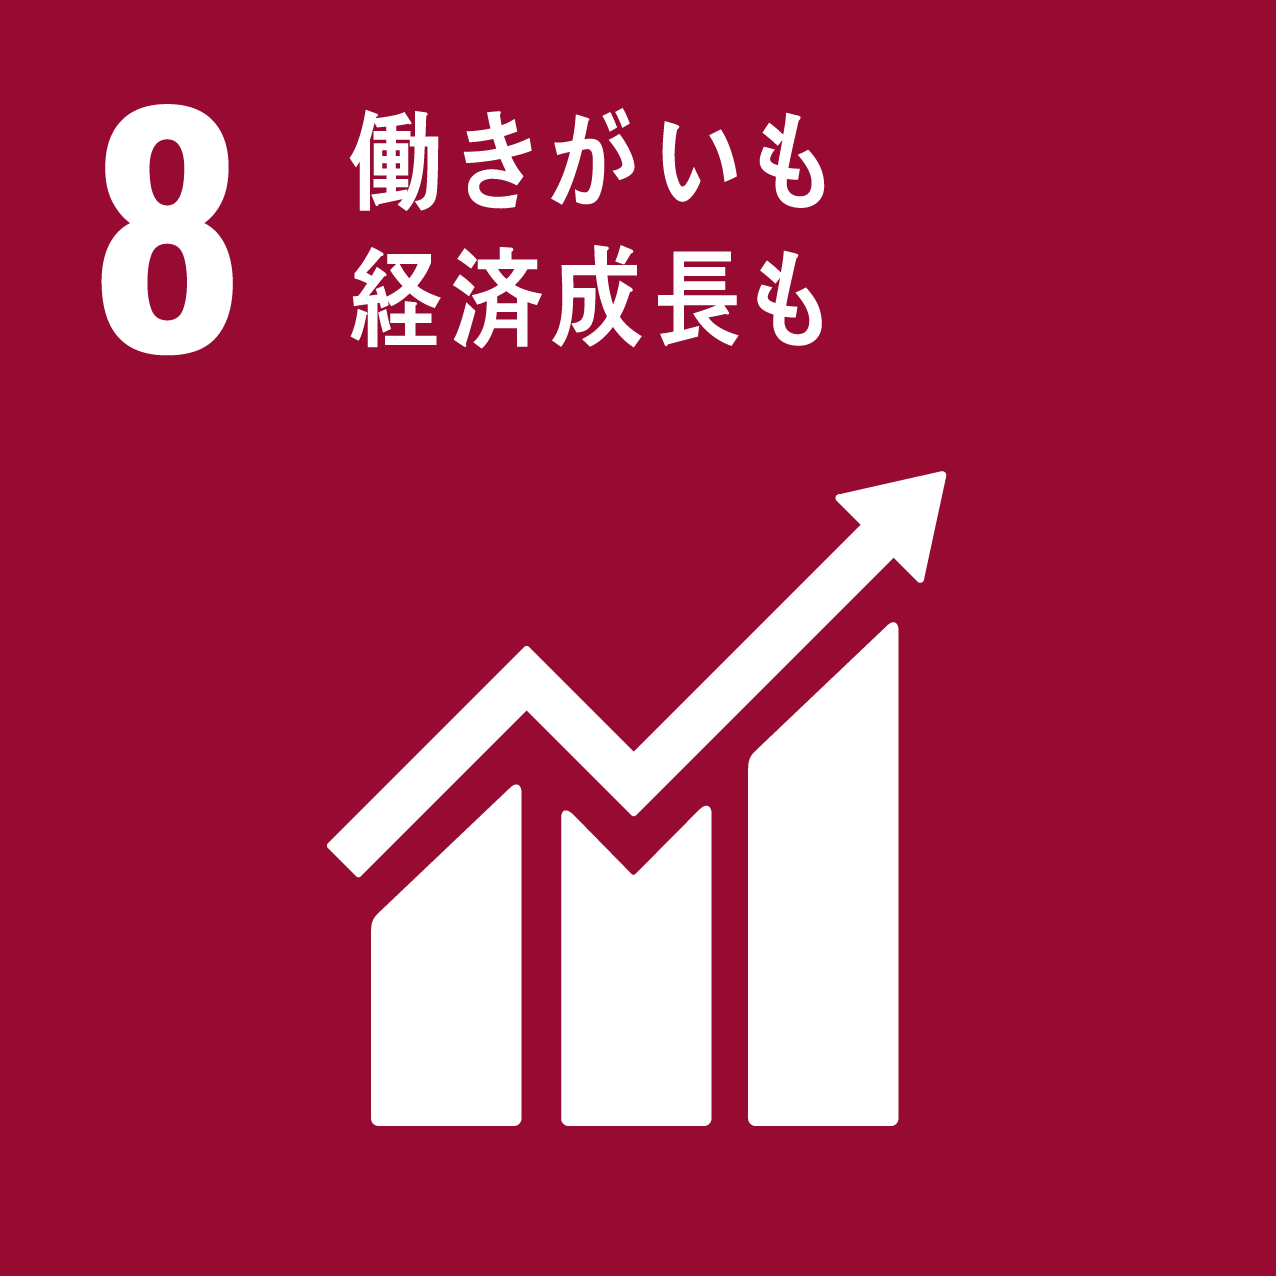 Goal8 働きがいも 経済成長も